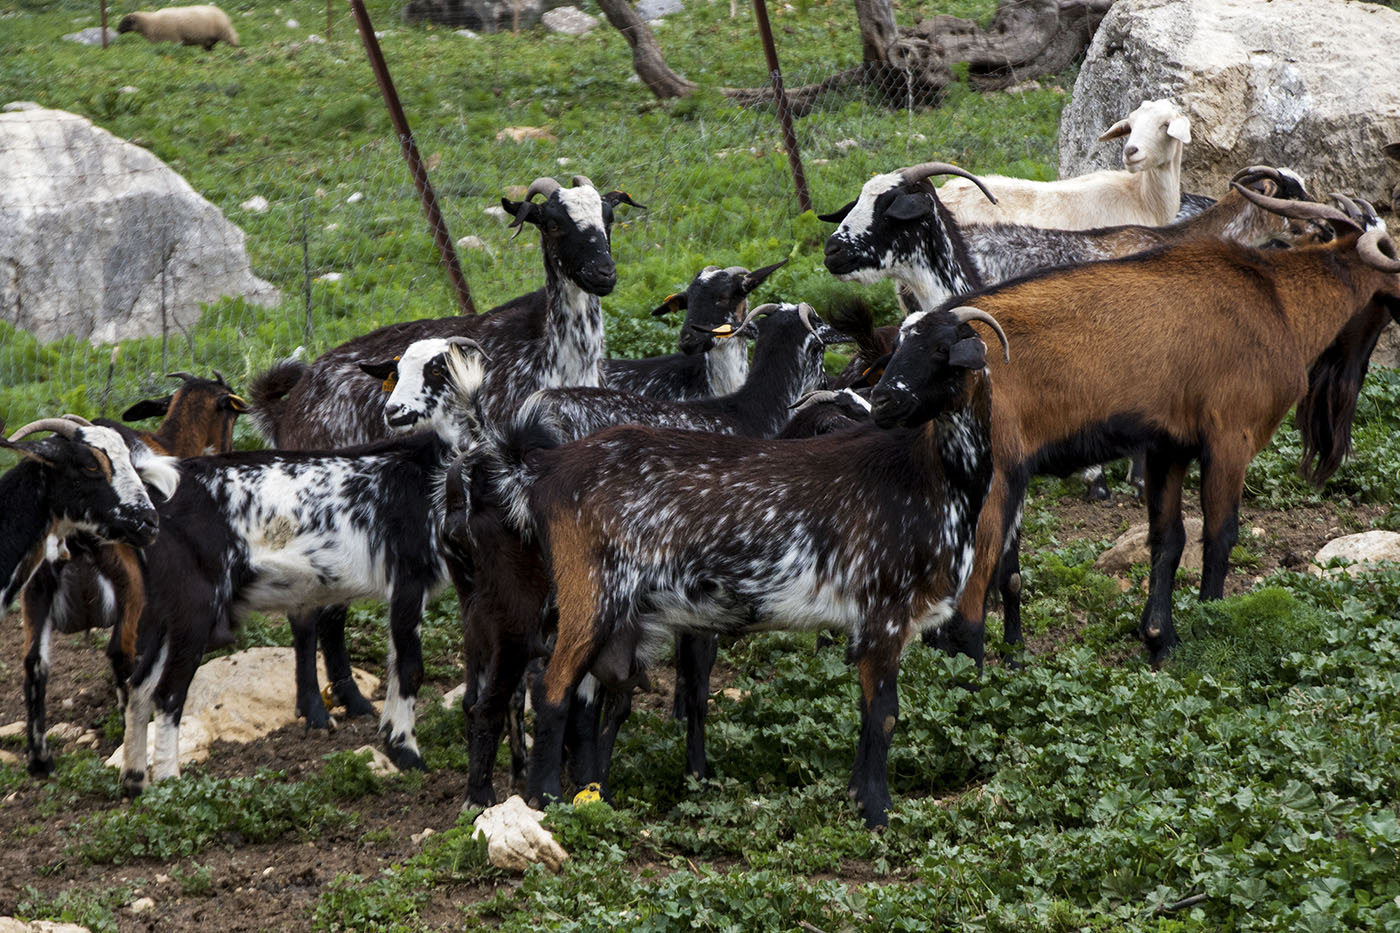 Quesos Sierra Crestellina (Casares)